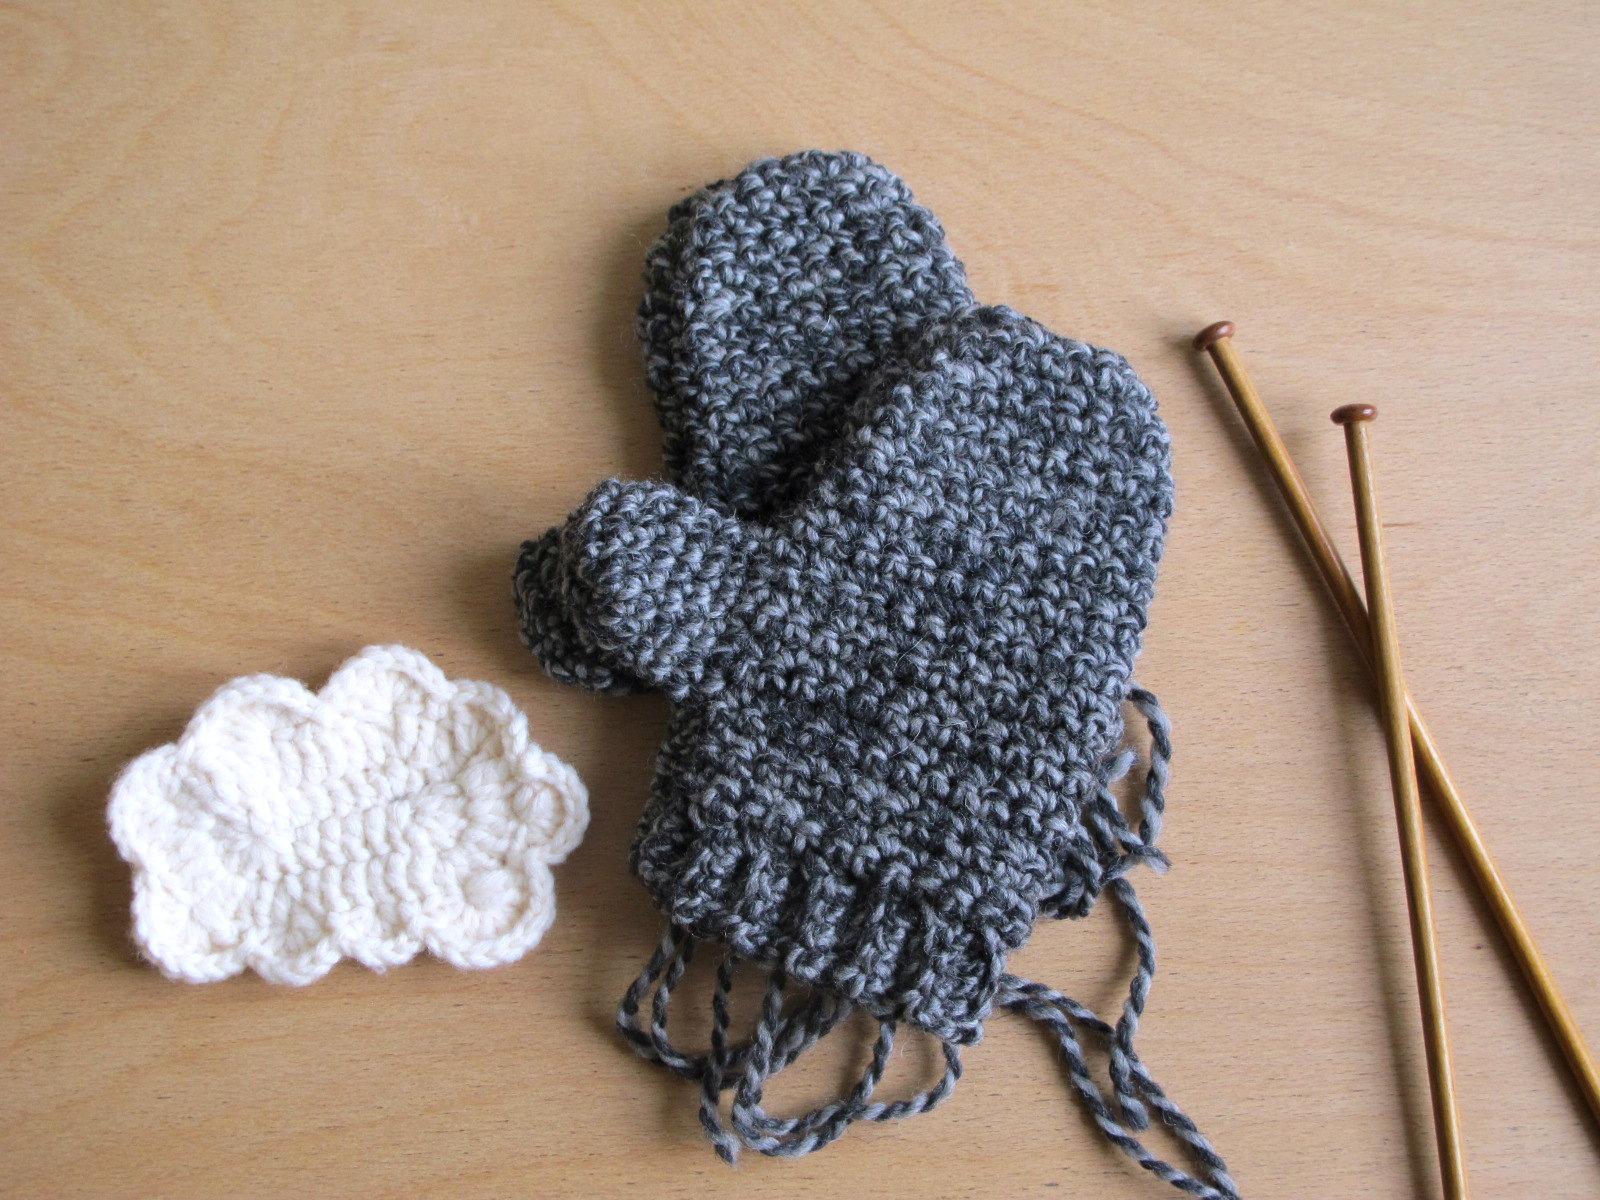 Où apprendre à tricoter à Milan?